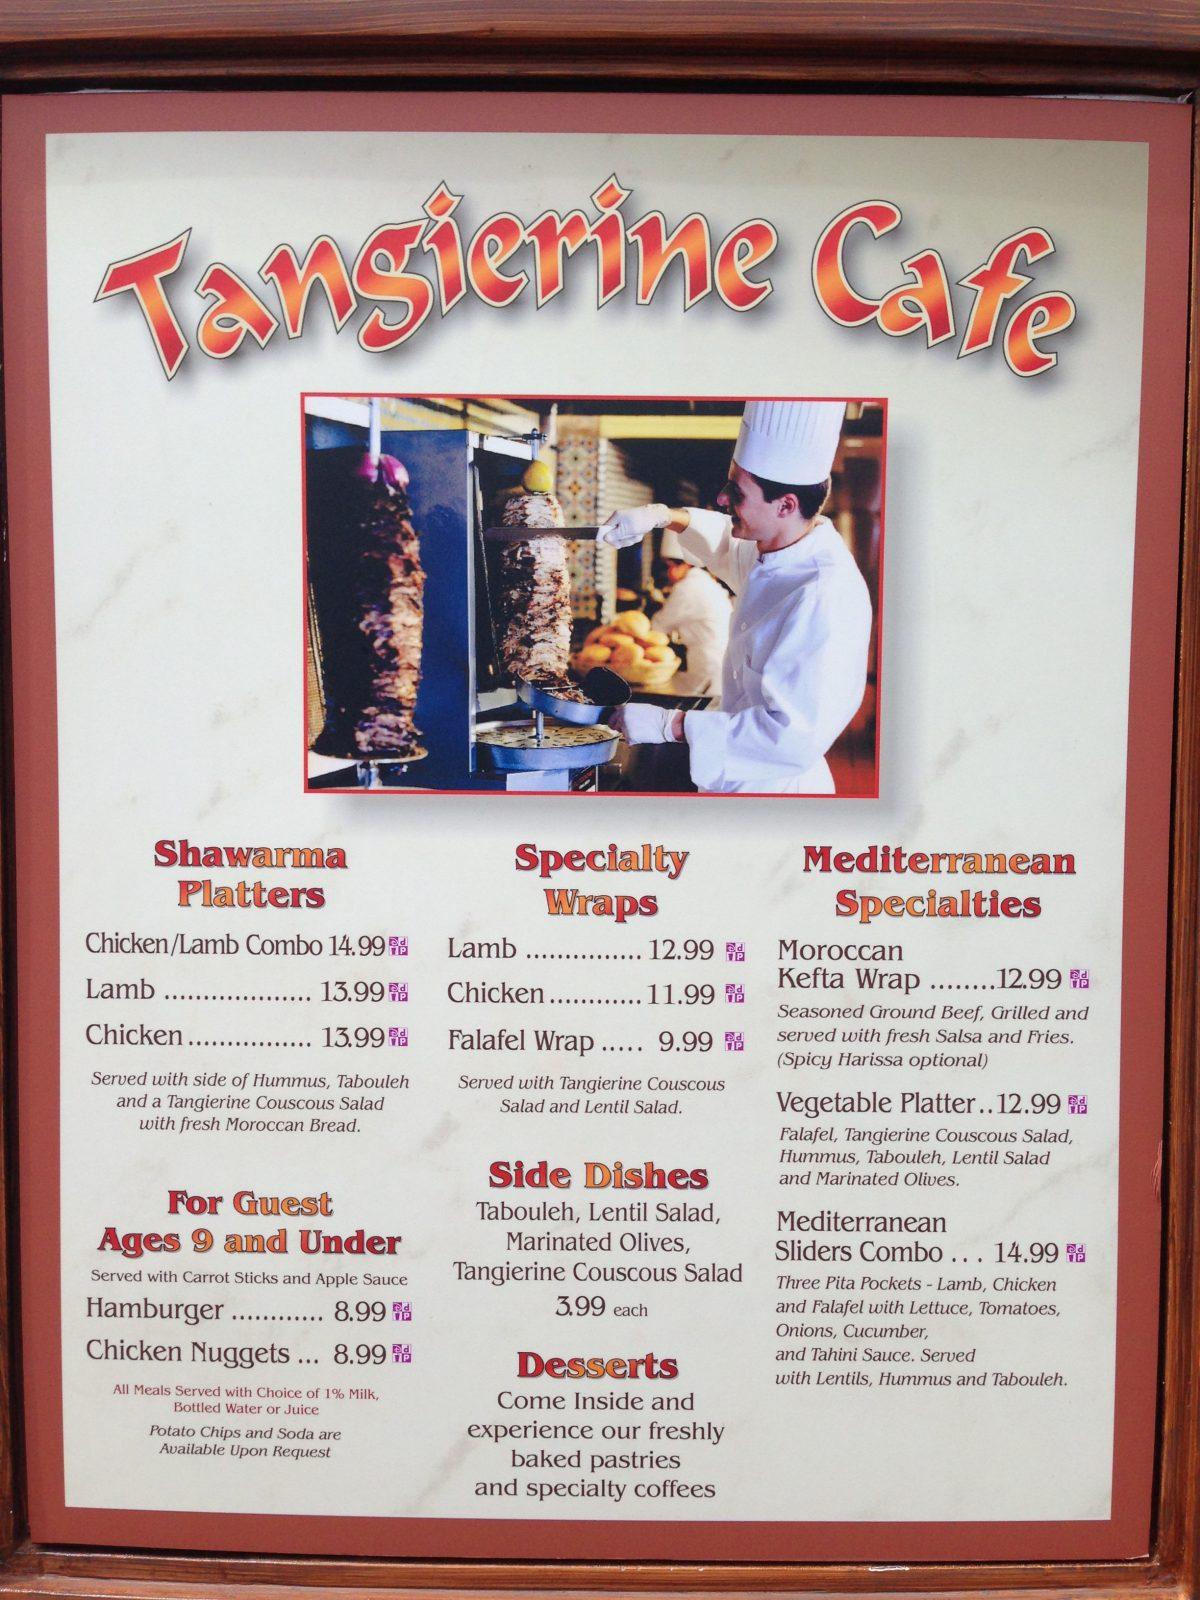 menu with pricing